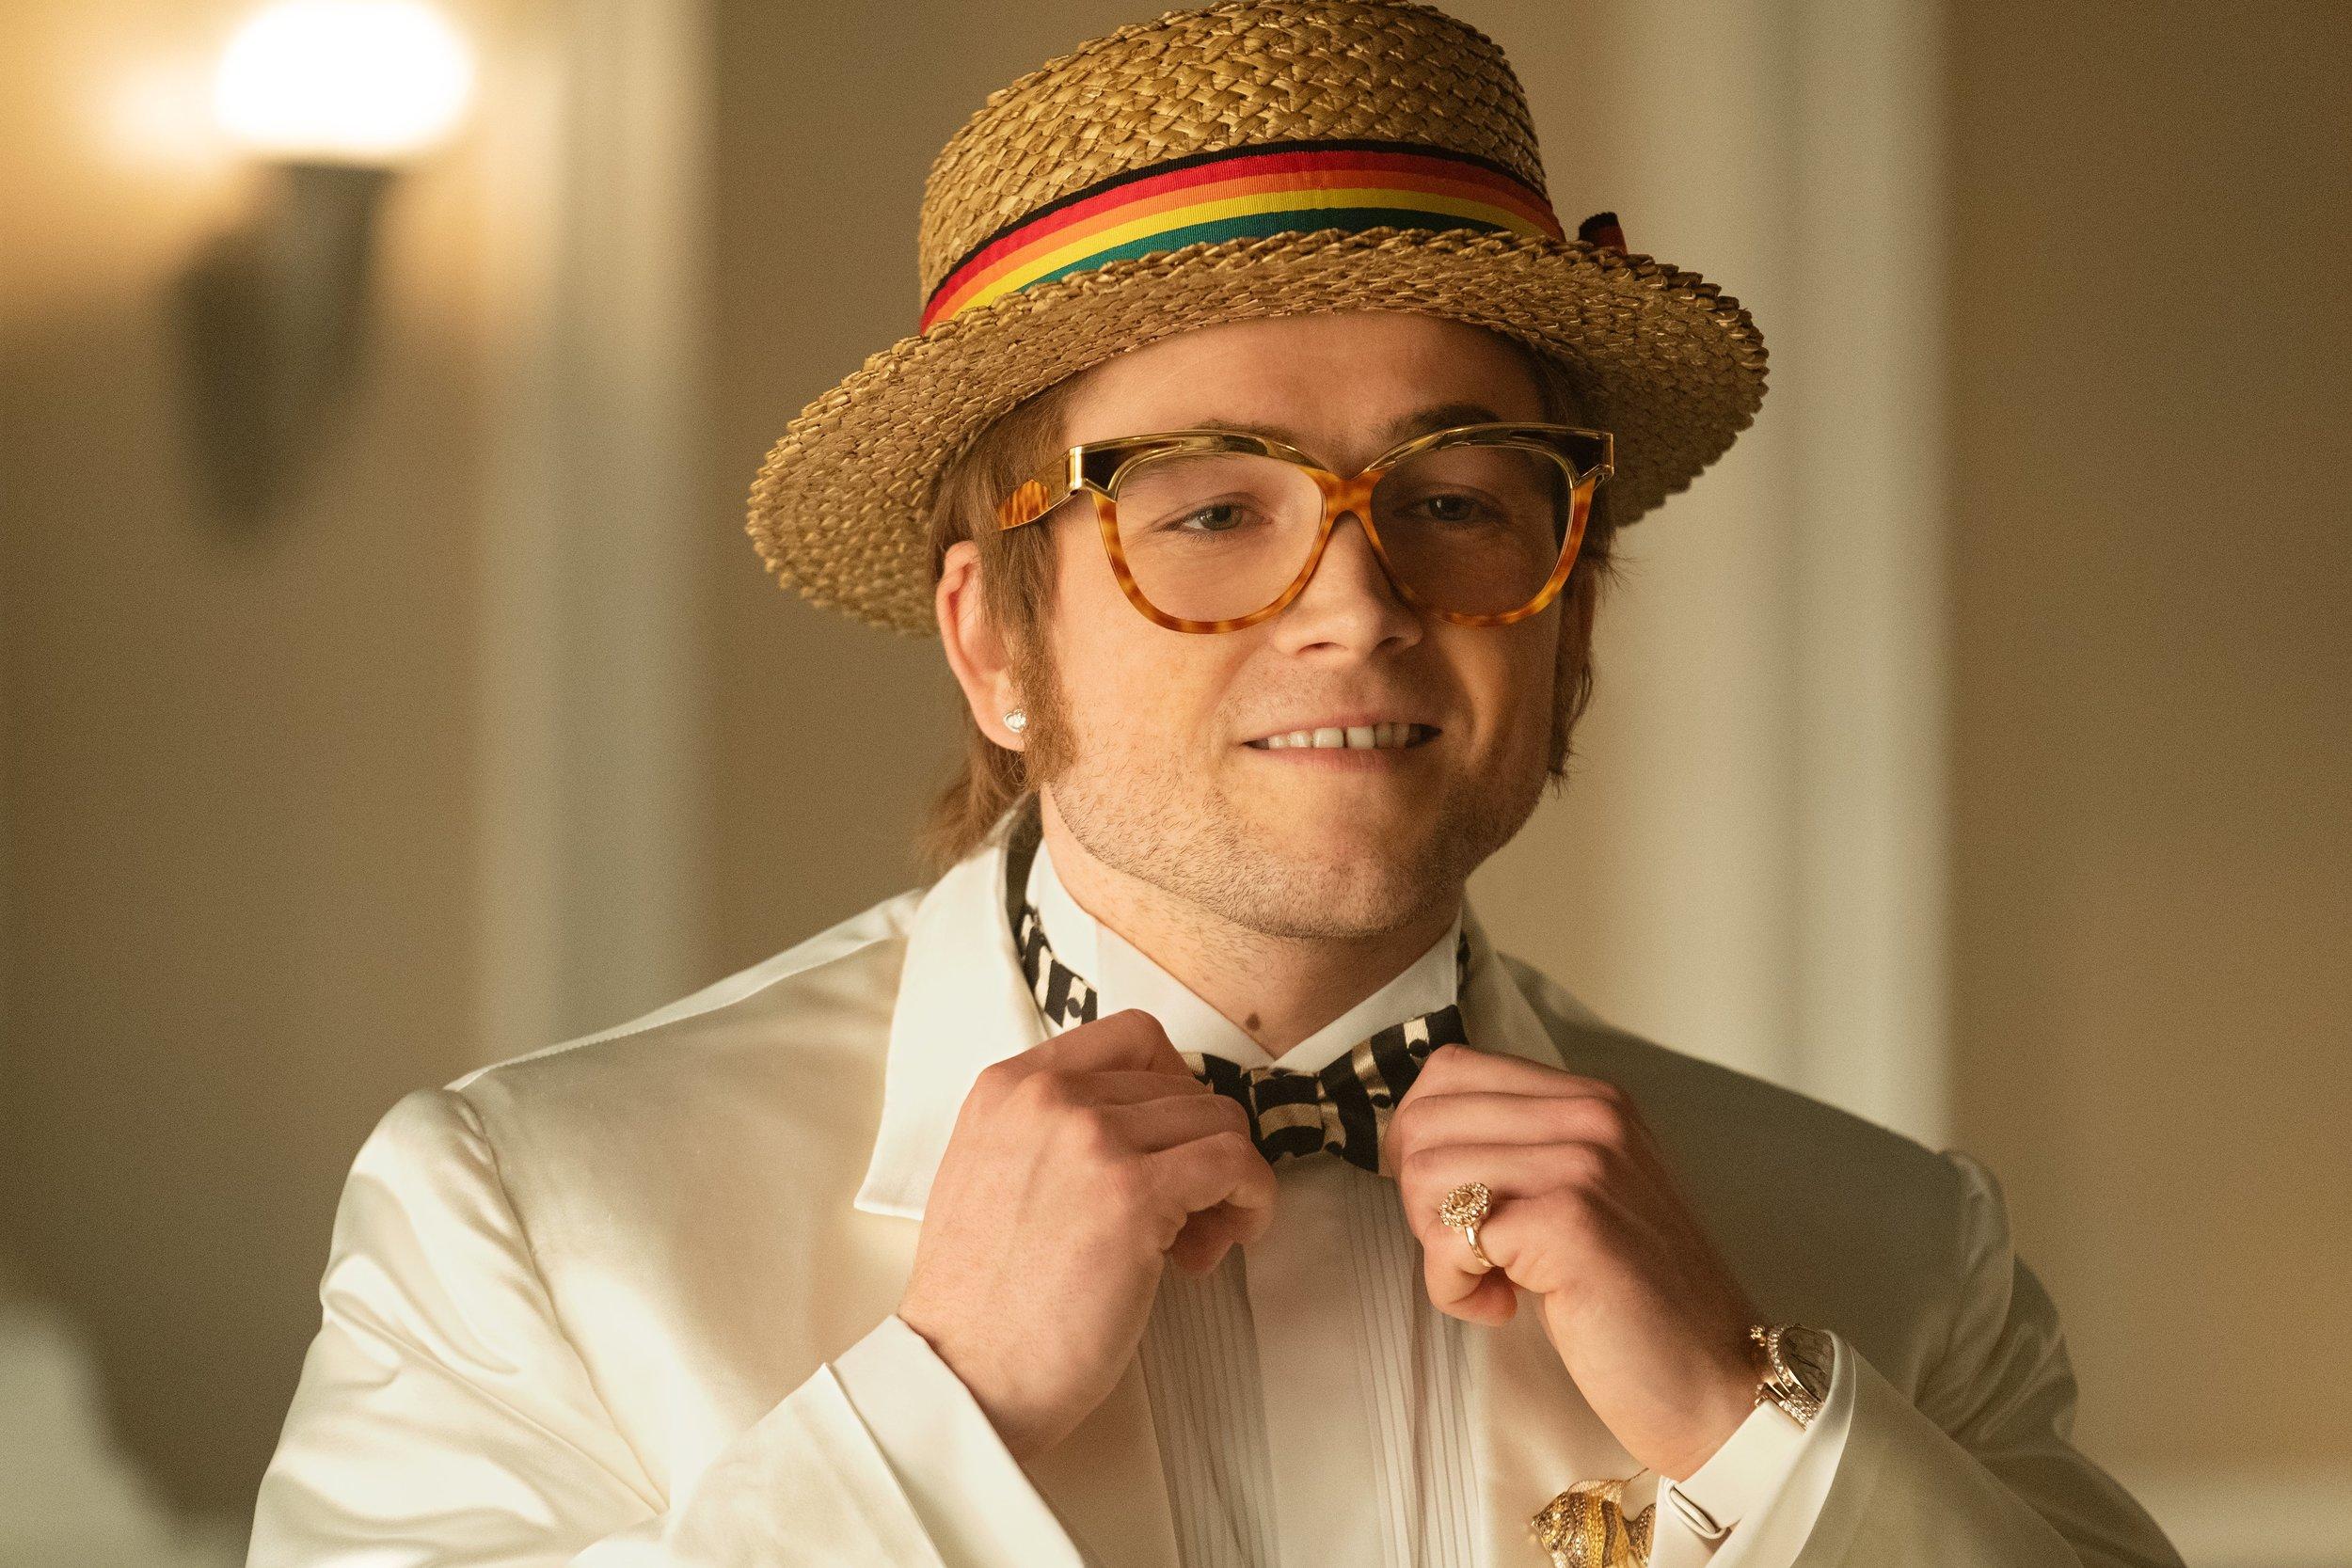 Taron Egerton is ready for his close-up as Elton John in Rocketman.